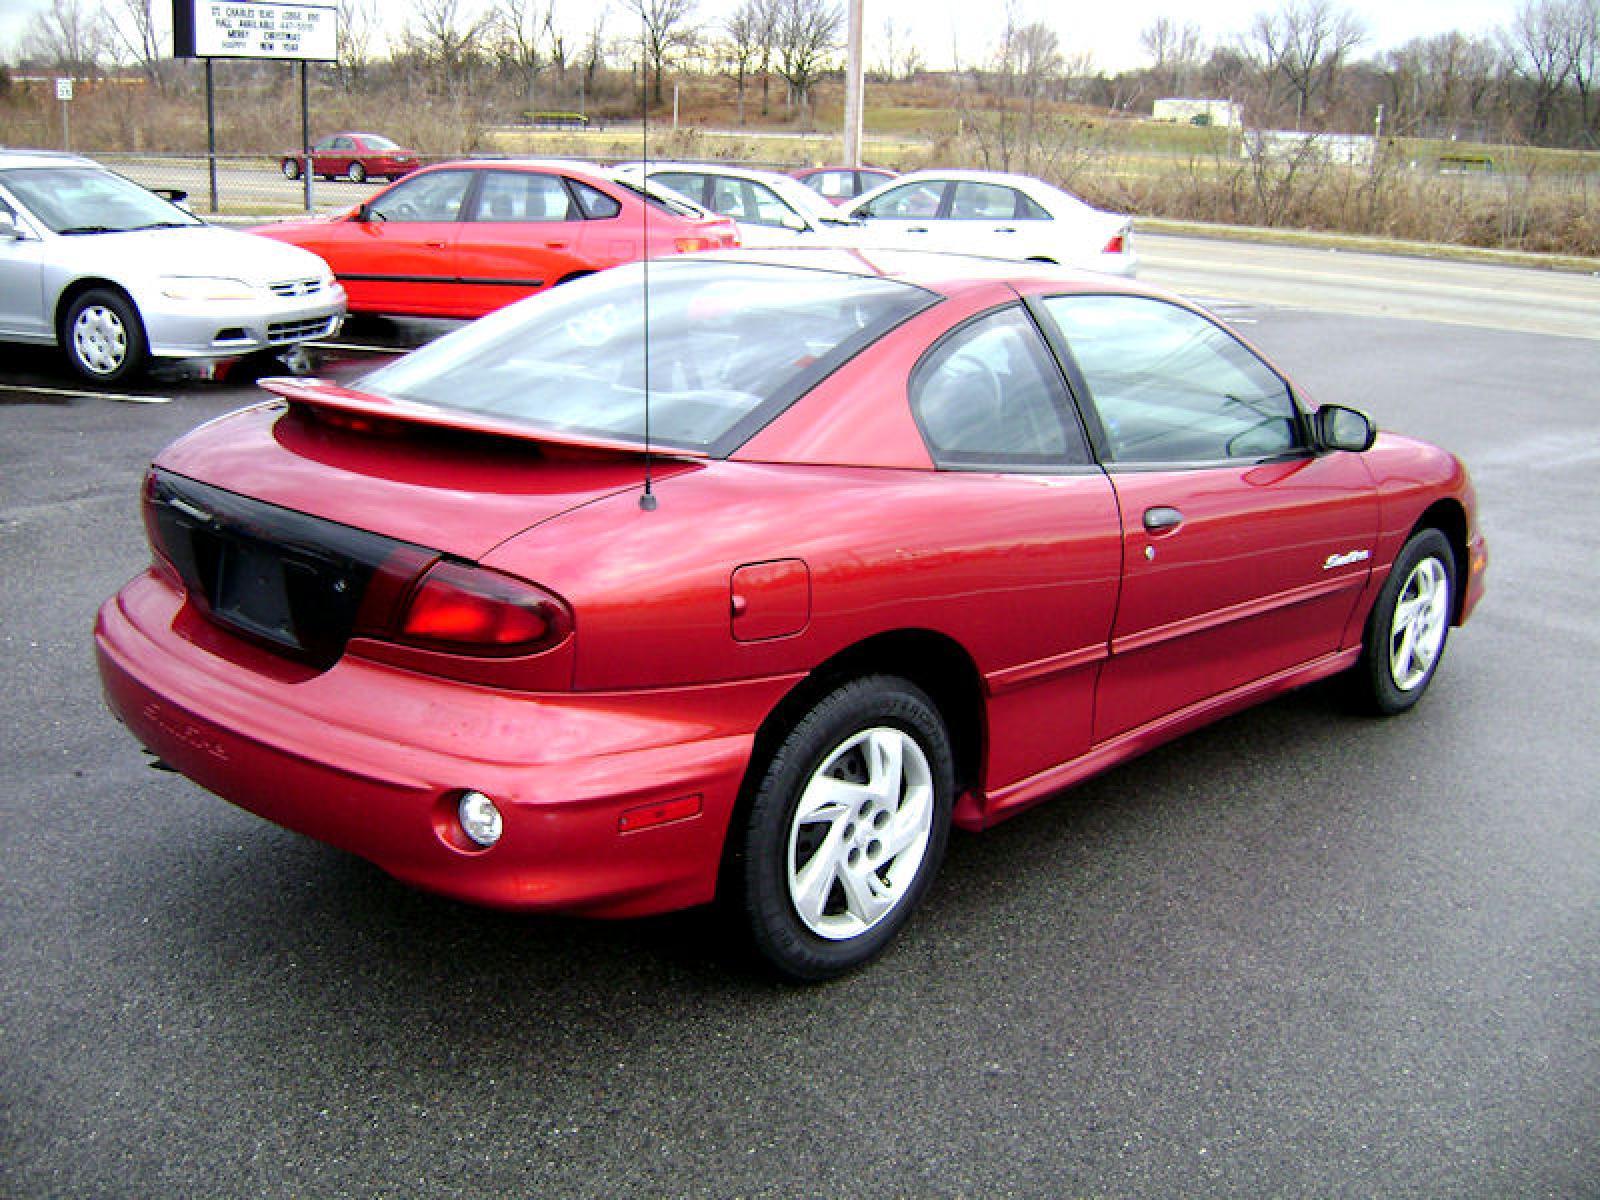 2000 Pontiac Sunfire #1 800 1024 1280 1600 origin